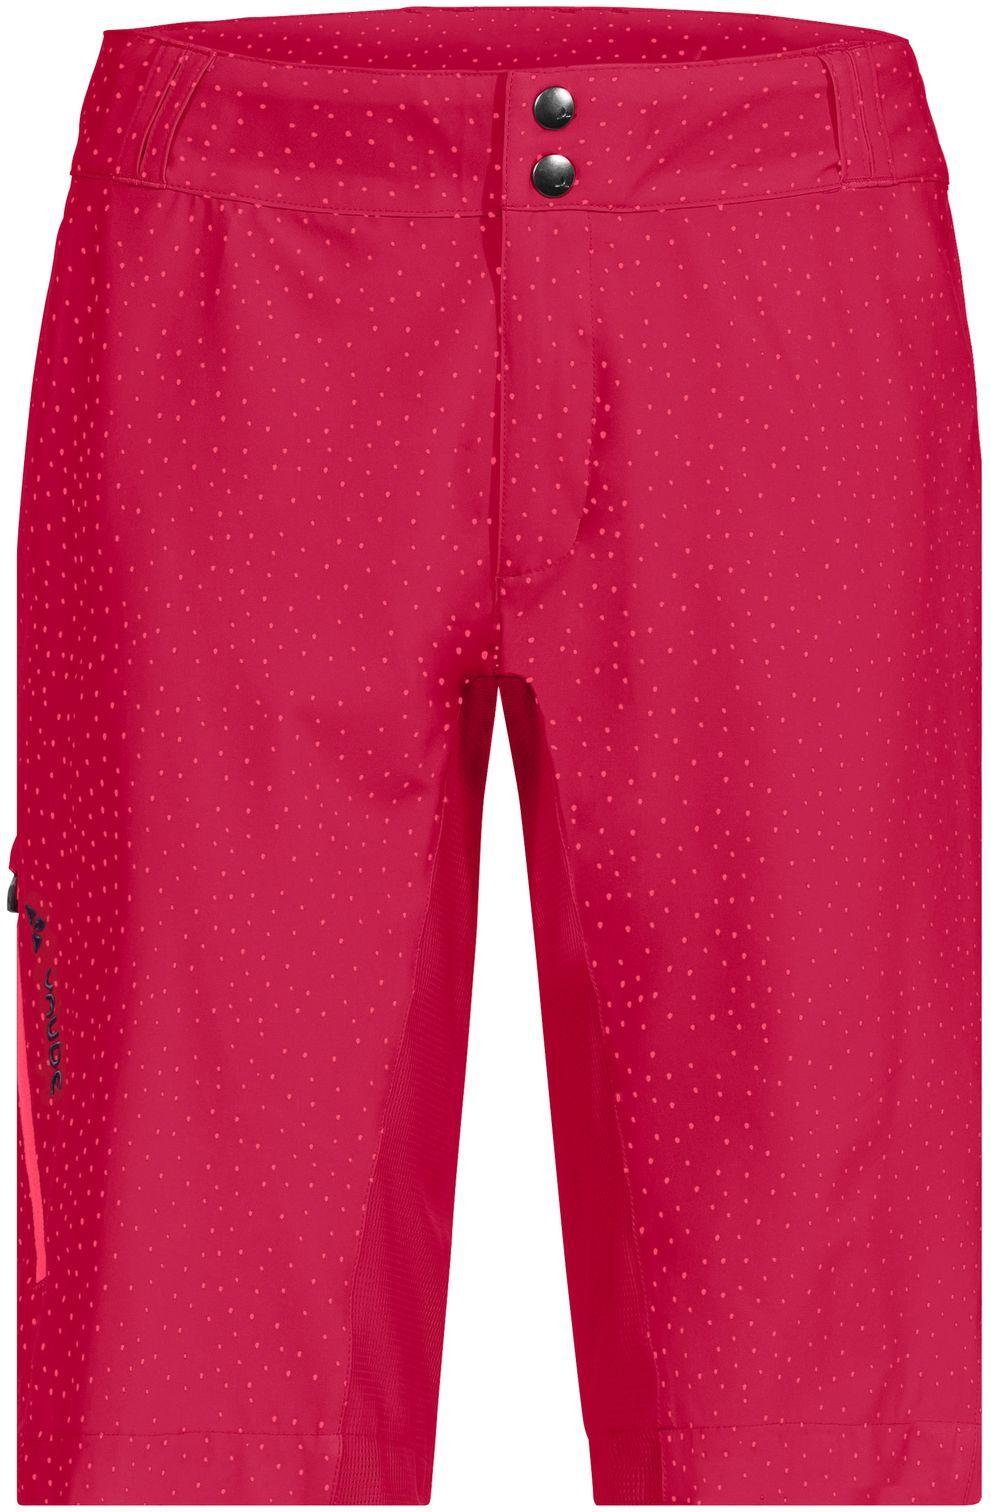 Vaude Women's Ligure Shorts - cranberry XS